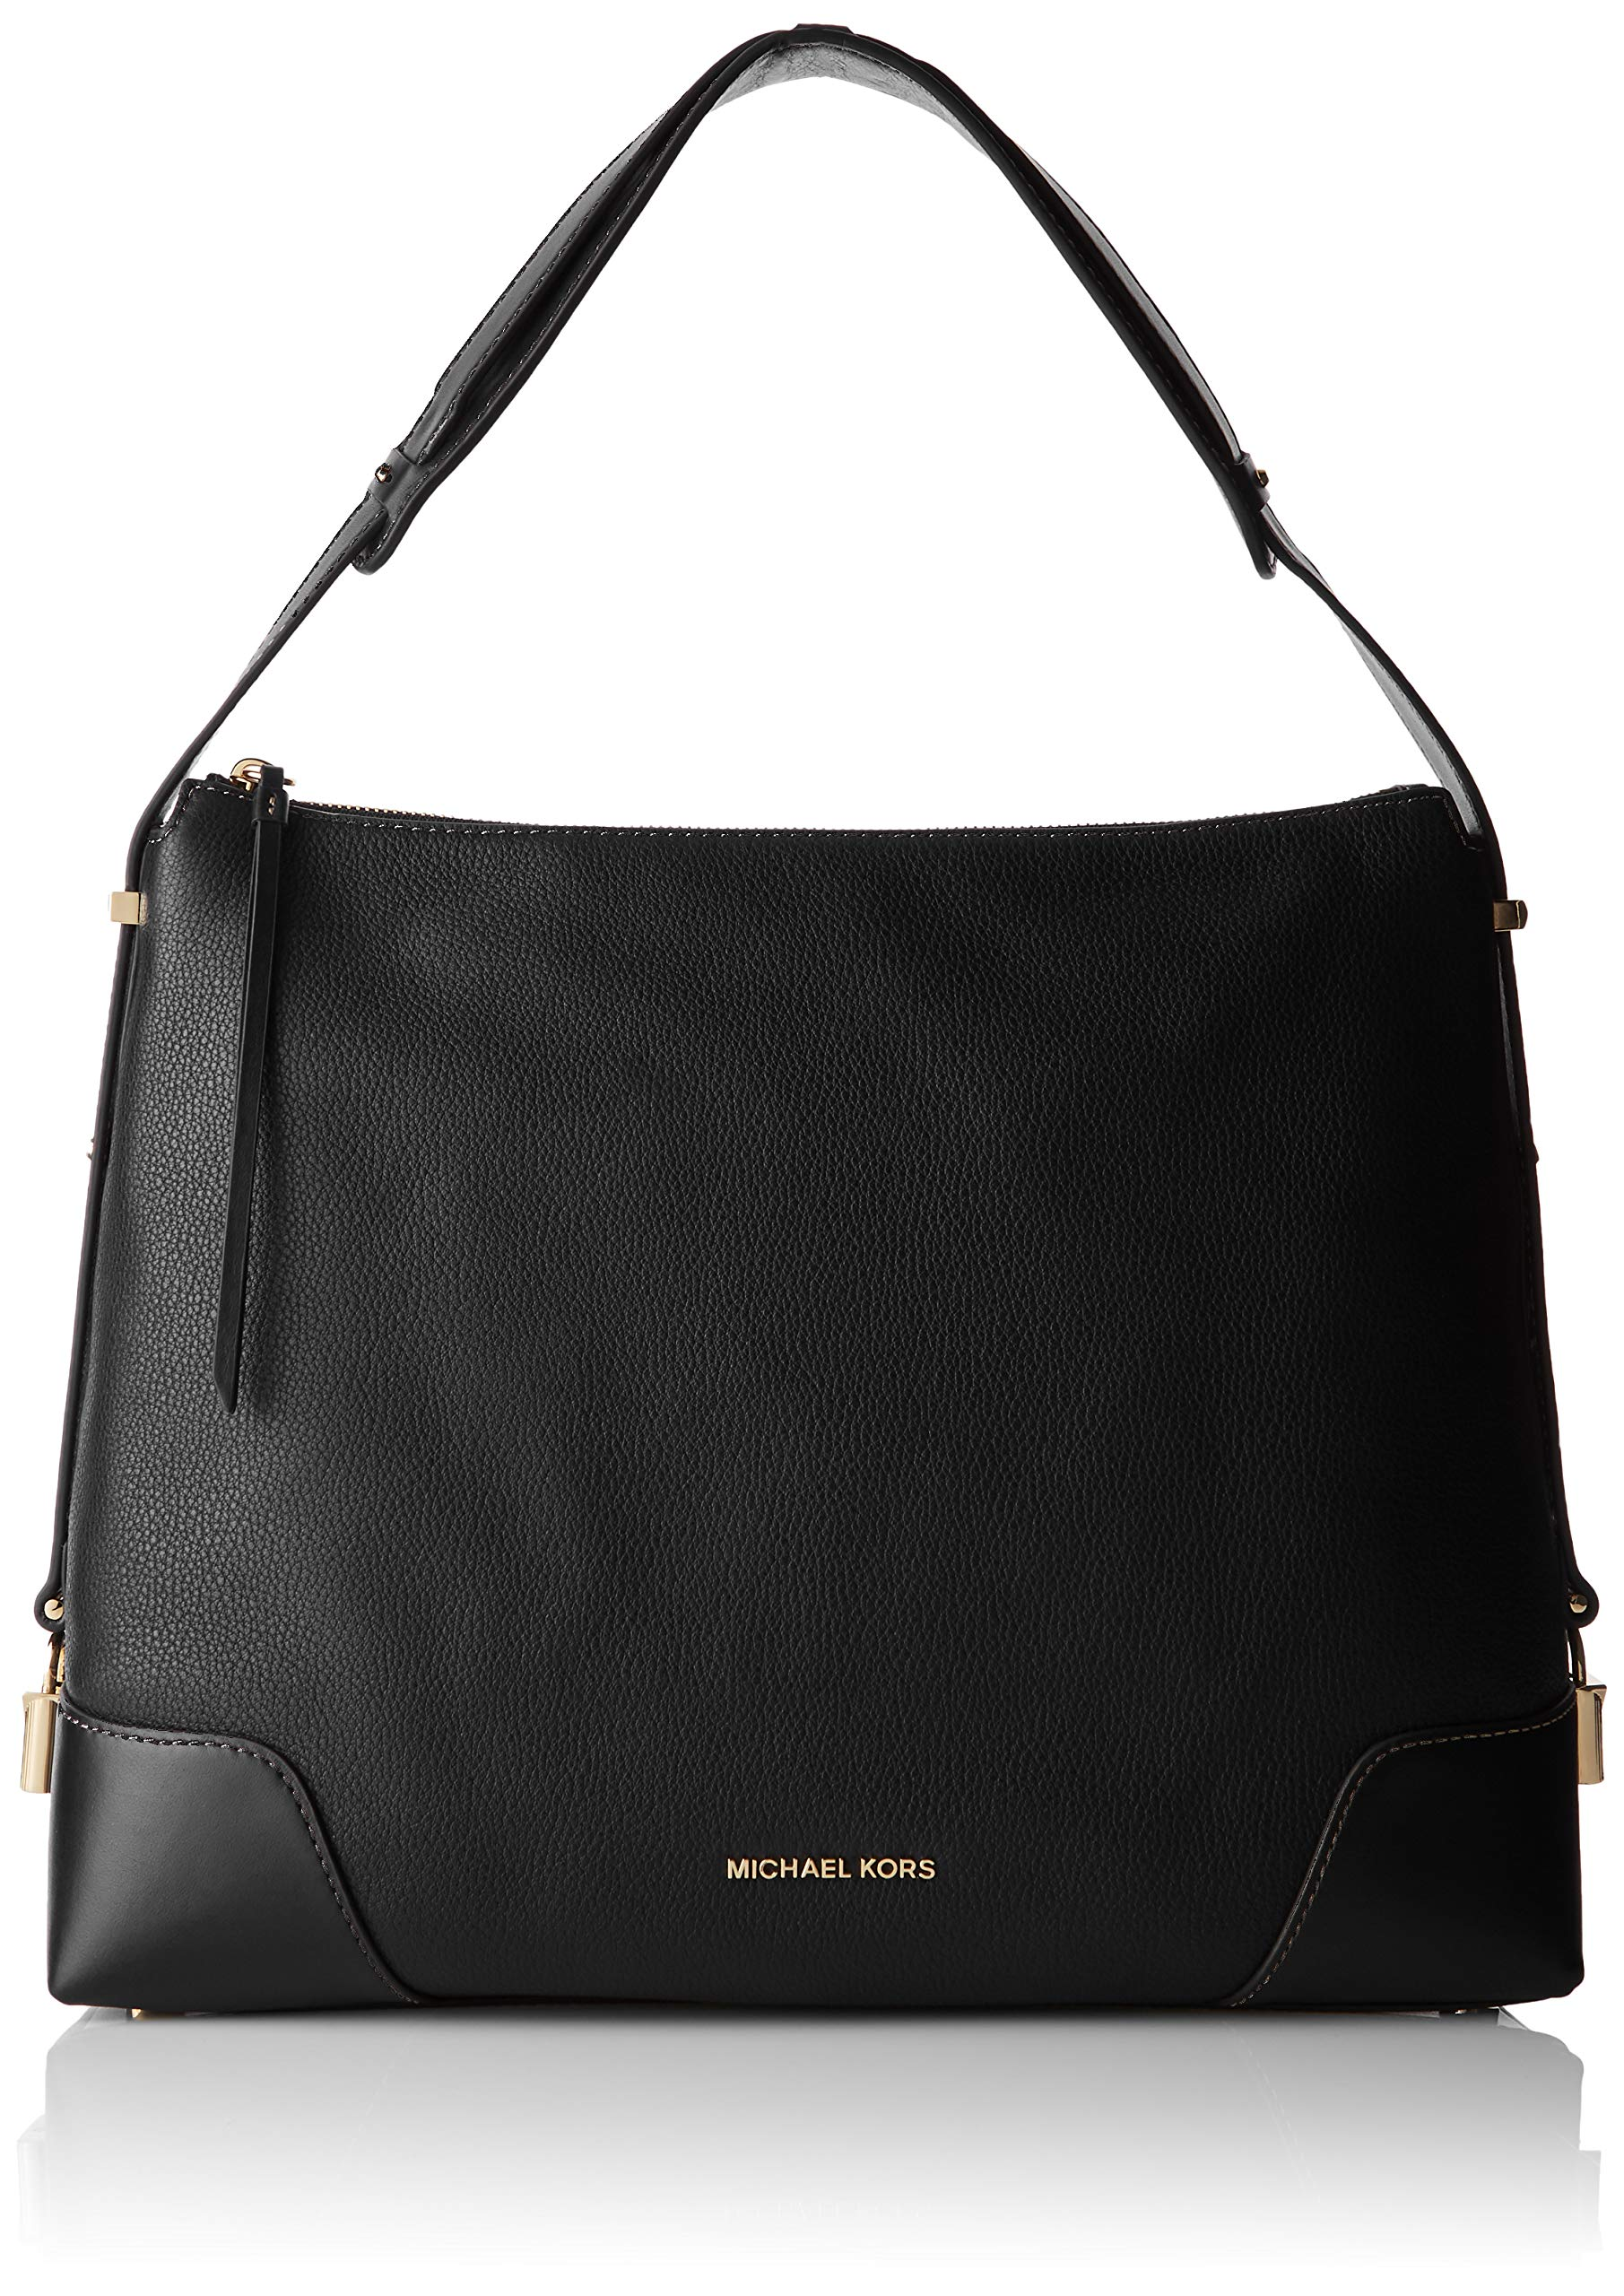 Michael Kors Womens Crosby Shoulder Bag Black (Black)